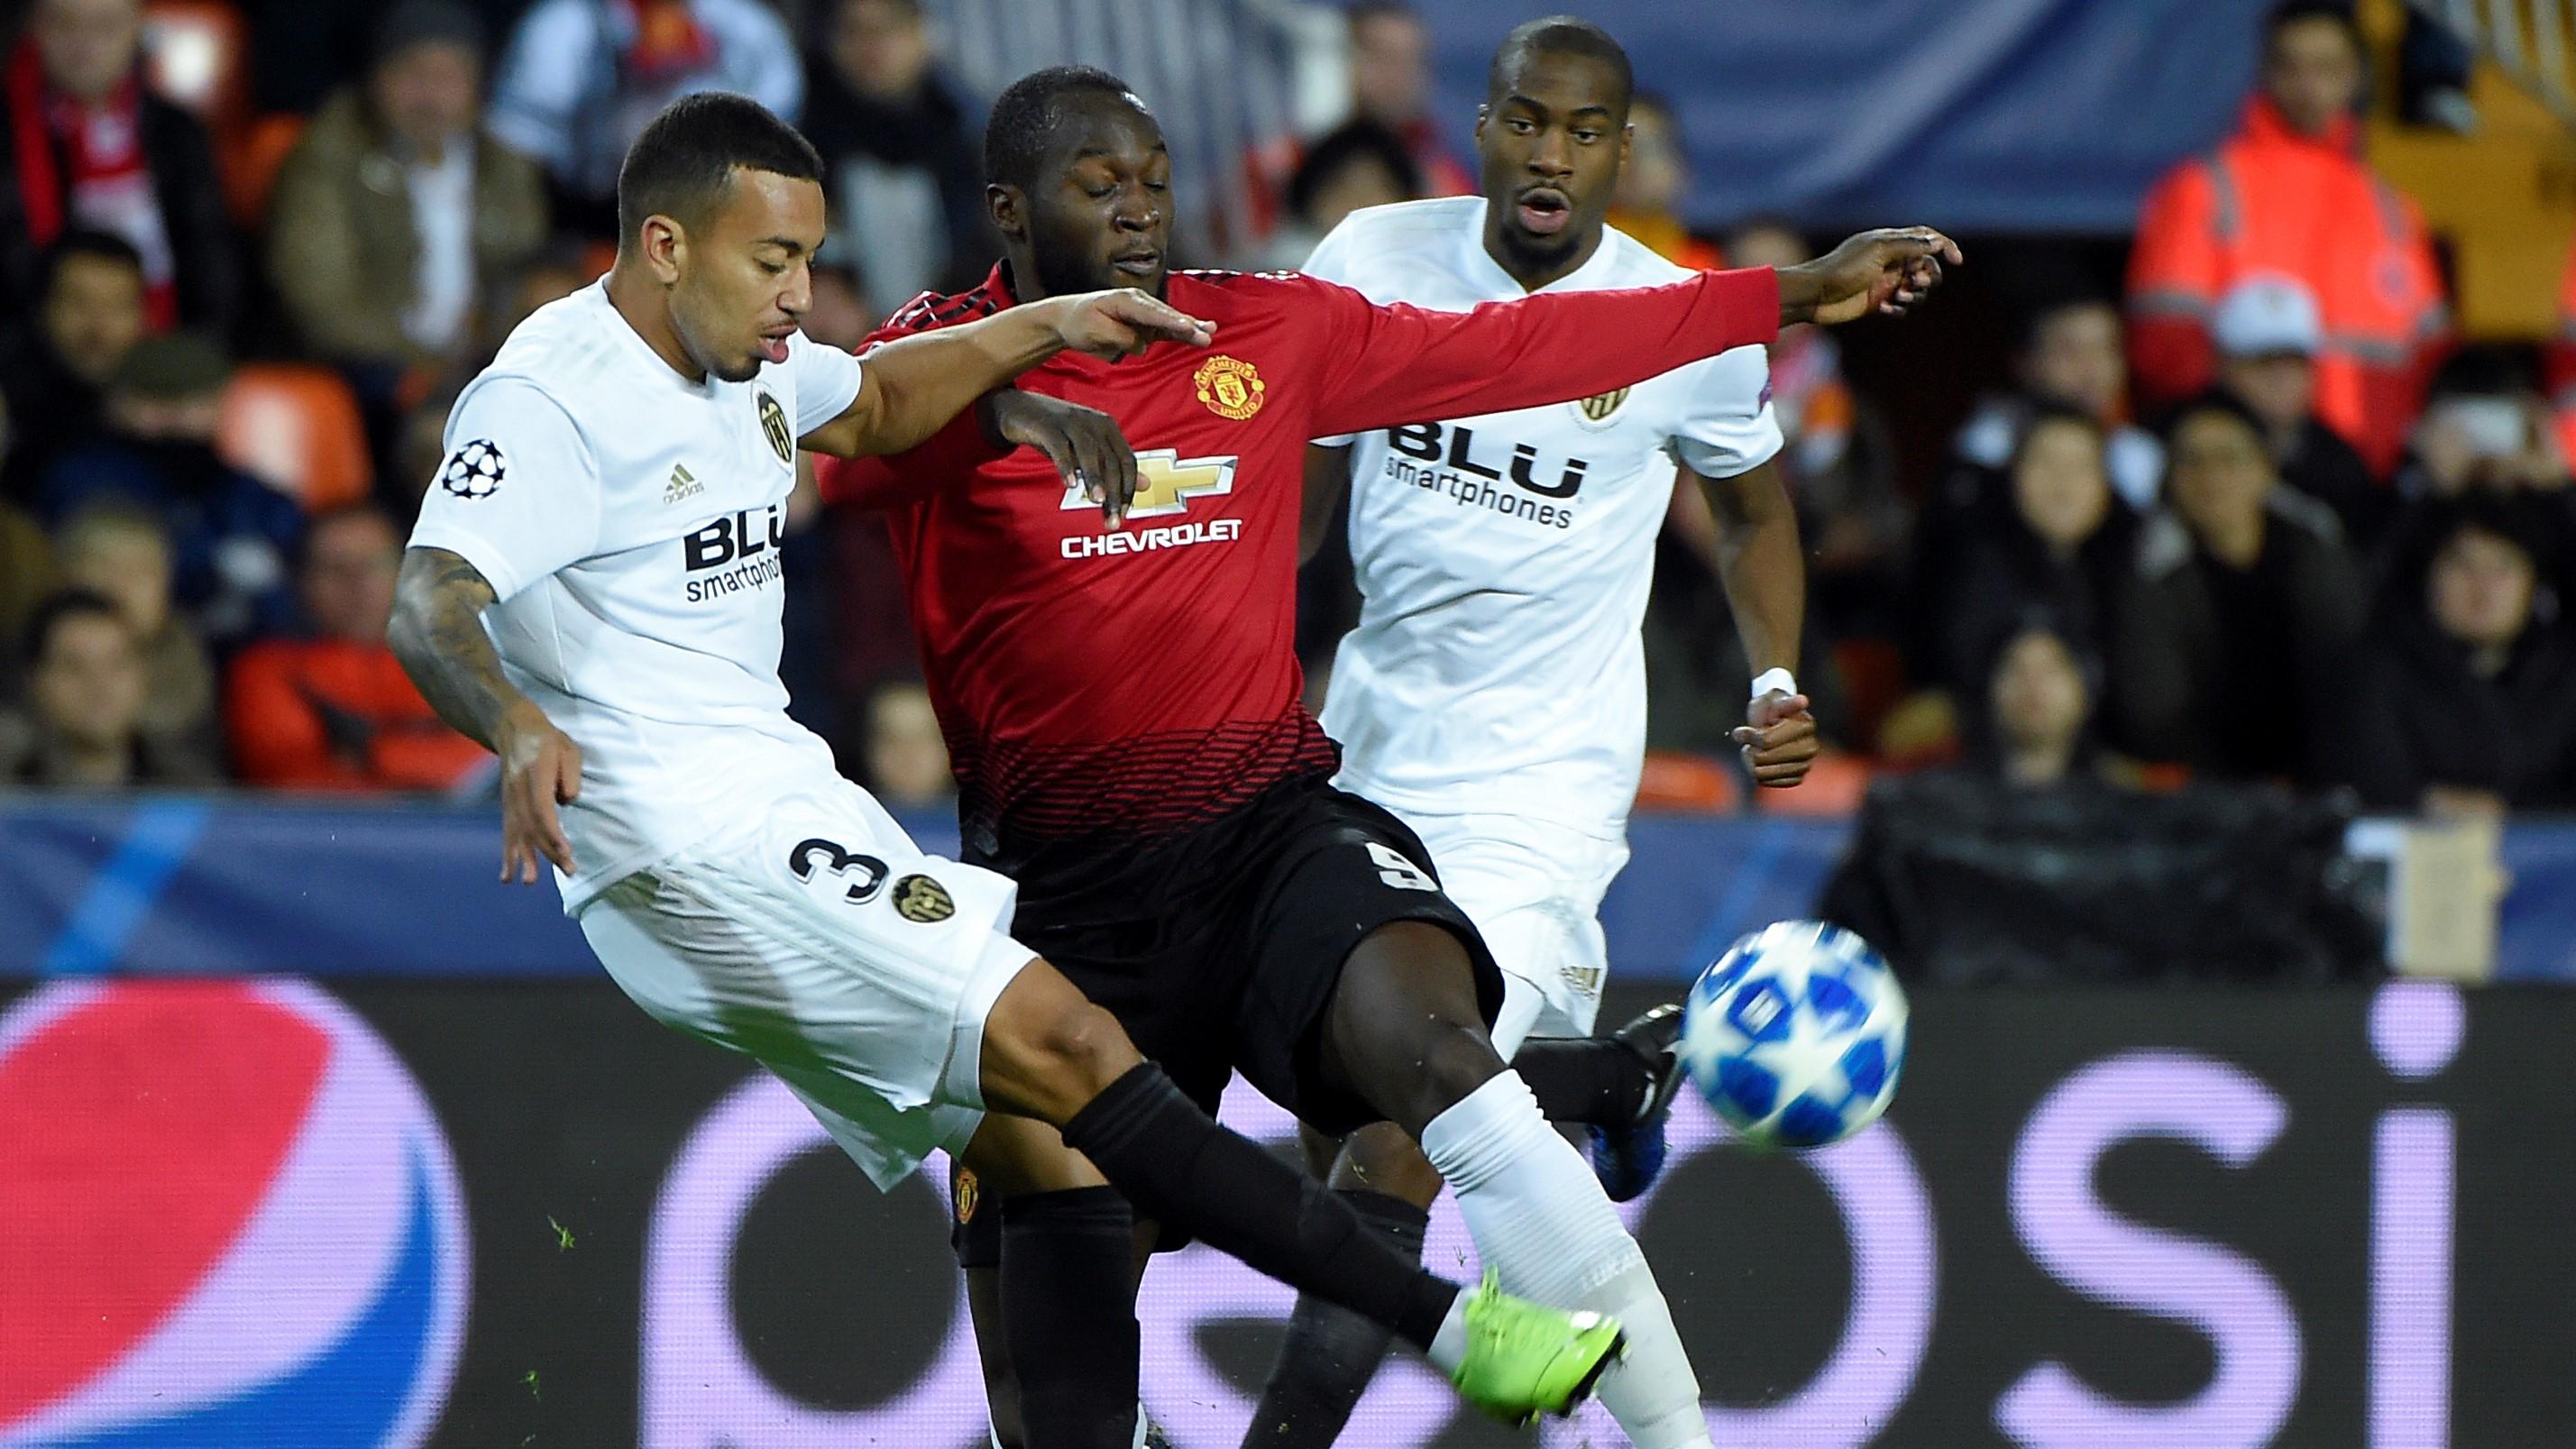 Ruben Vezo Romelu Lukaku Valencia Manchester United UCL 12122018